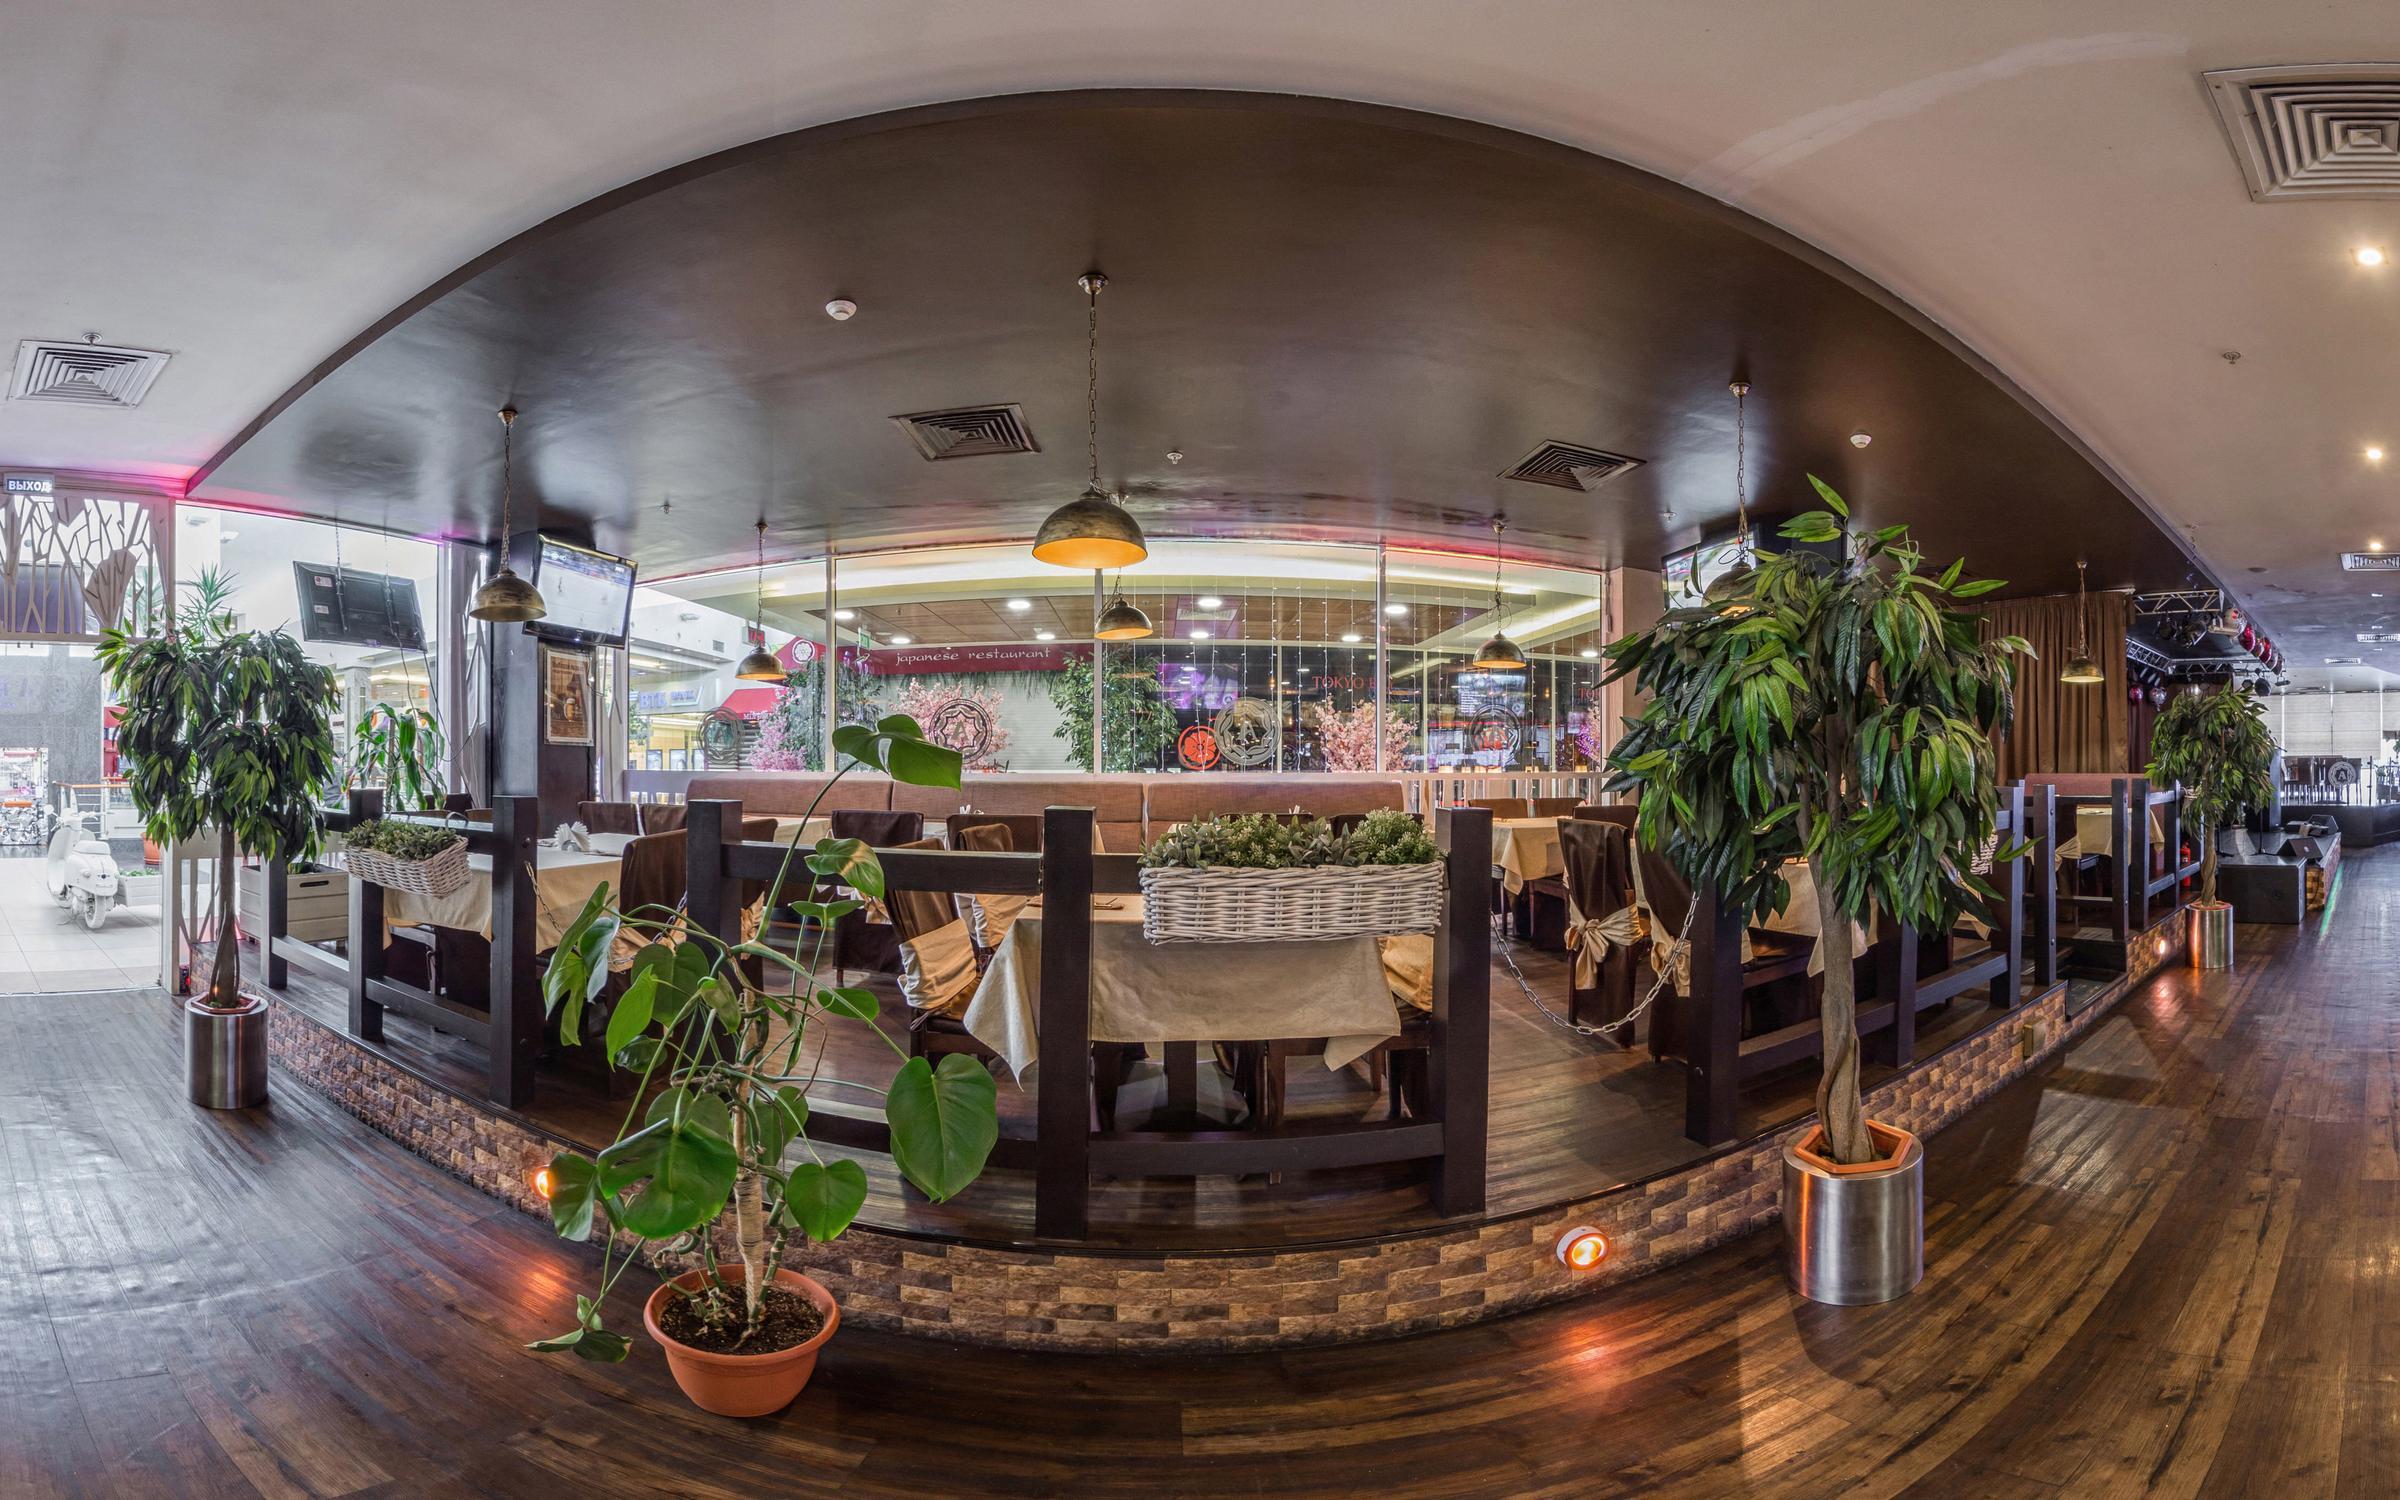 фотография Ресторана Абица в ТЦ Спектр